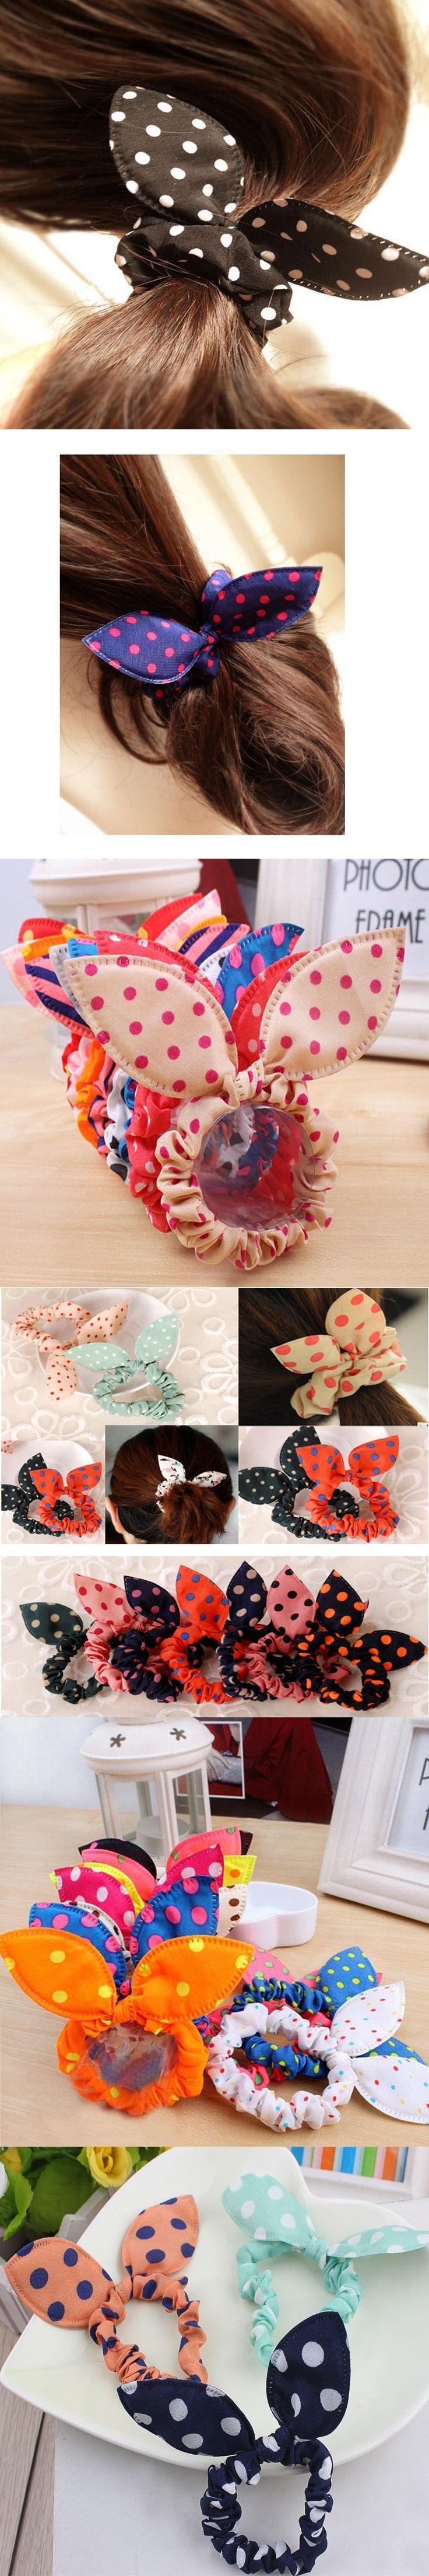 8Pcs/Lot Cute Women Flower Hair Elastic Rubber Bands Headbands Rabbit Ear Dot Headwear Elastic Hair Band Hair Ties Rope Scrunchy